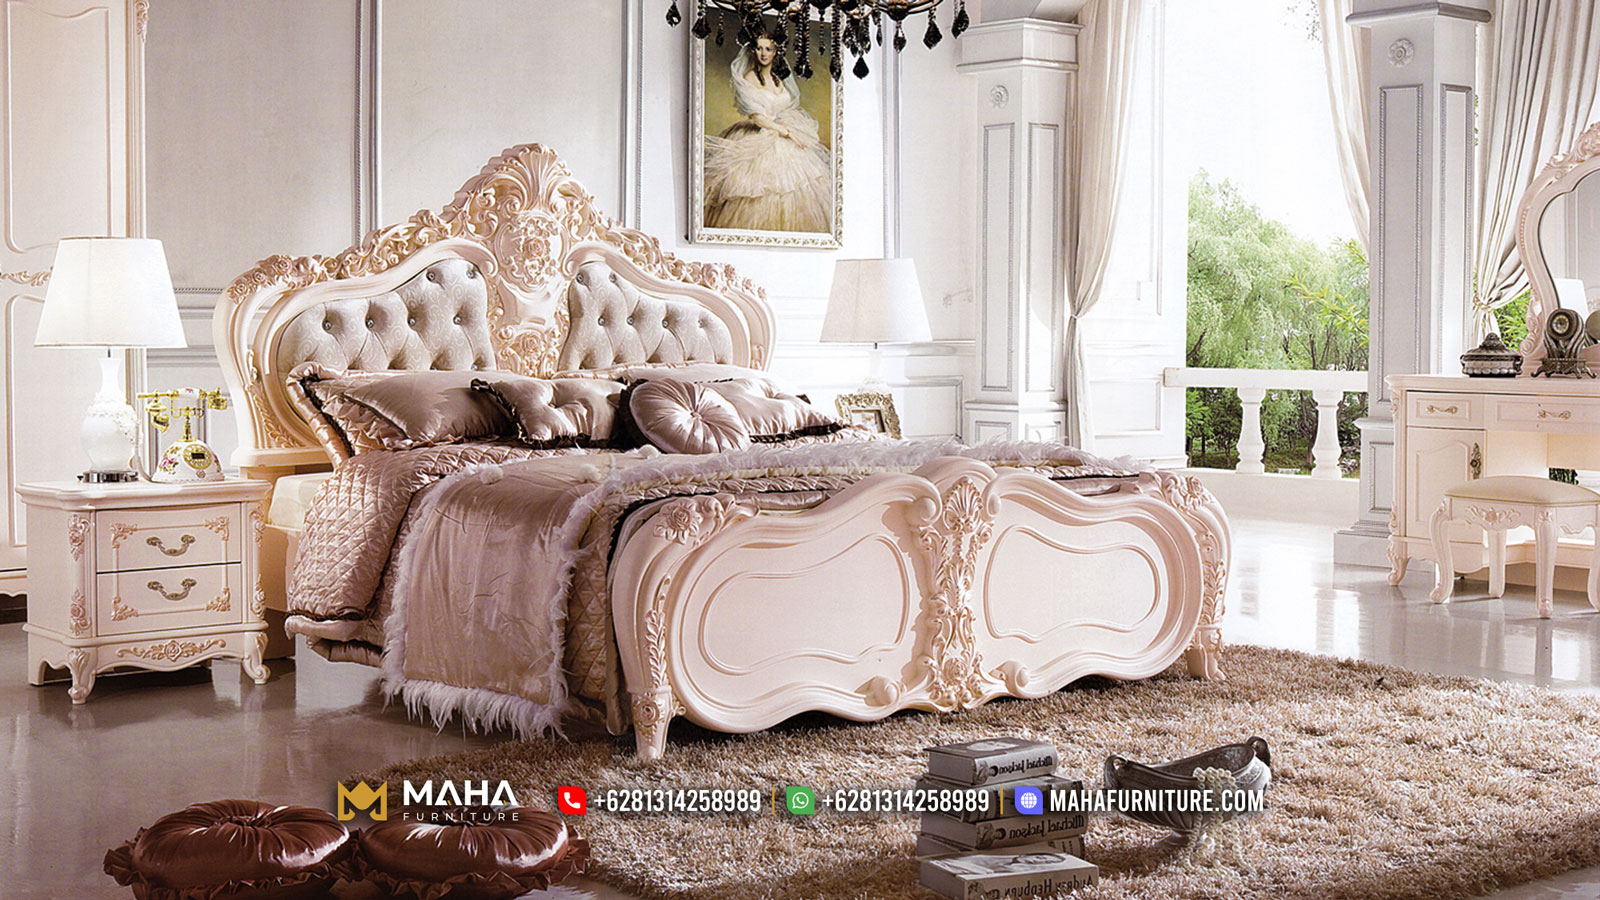 Hilarious Tempat Tidur Ukiran Mewah Luxury Carving Furniture Jepara Terbaru MF349